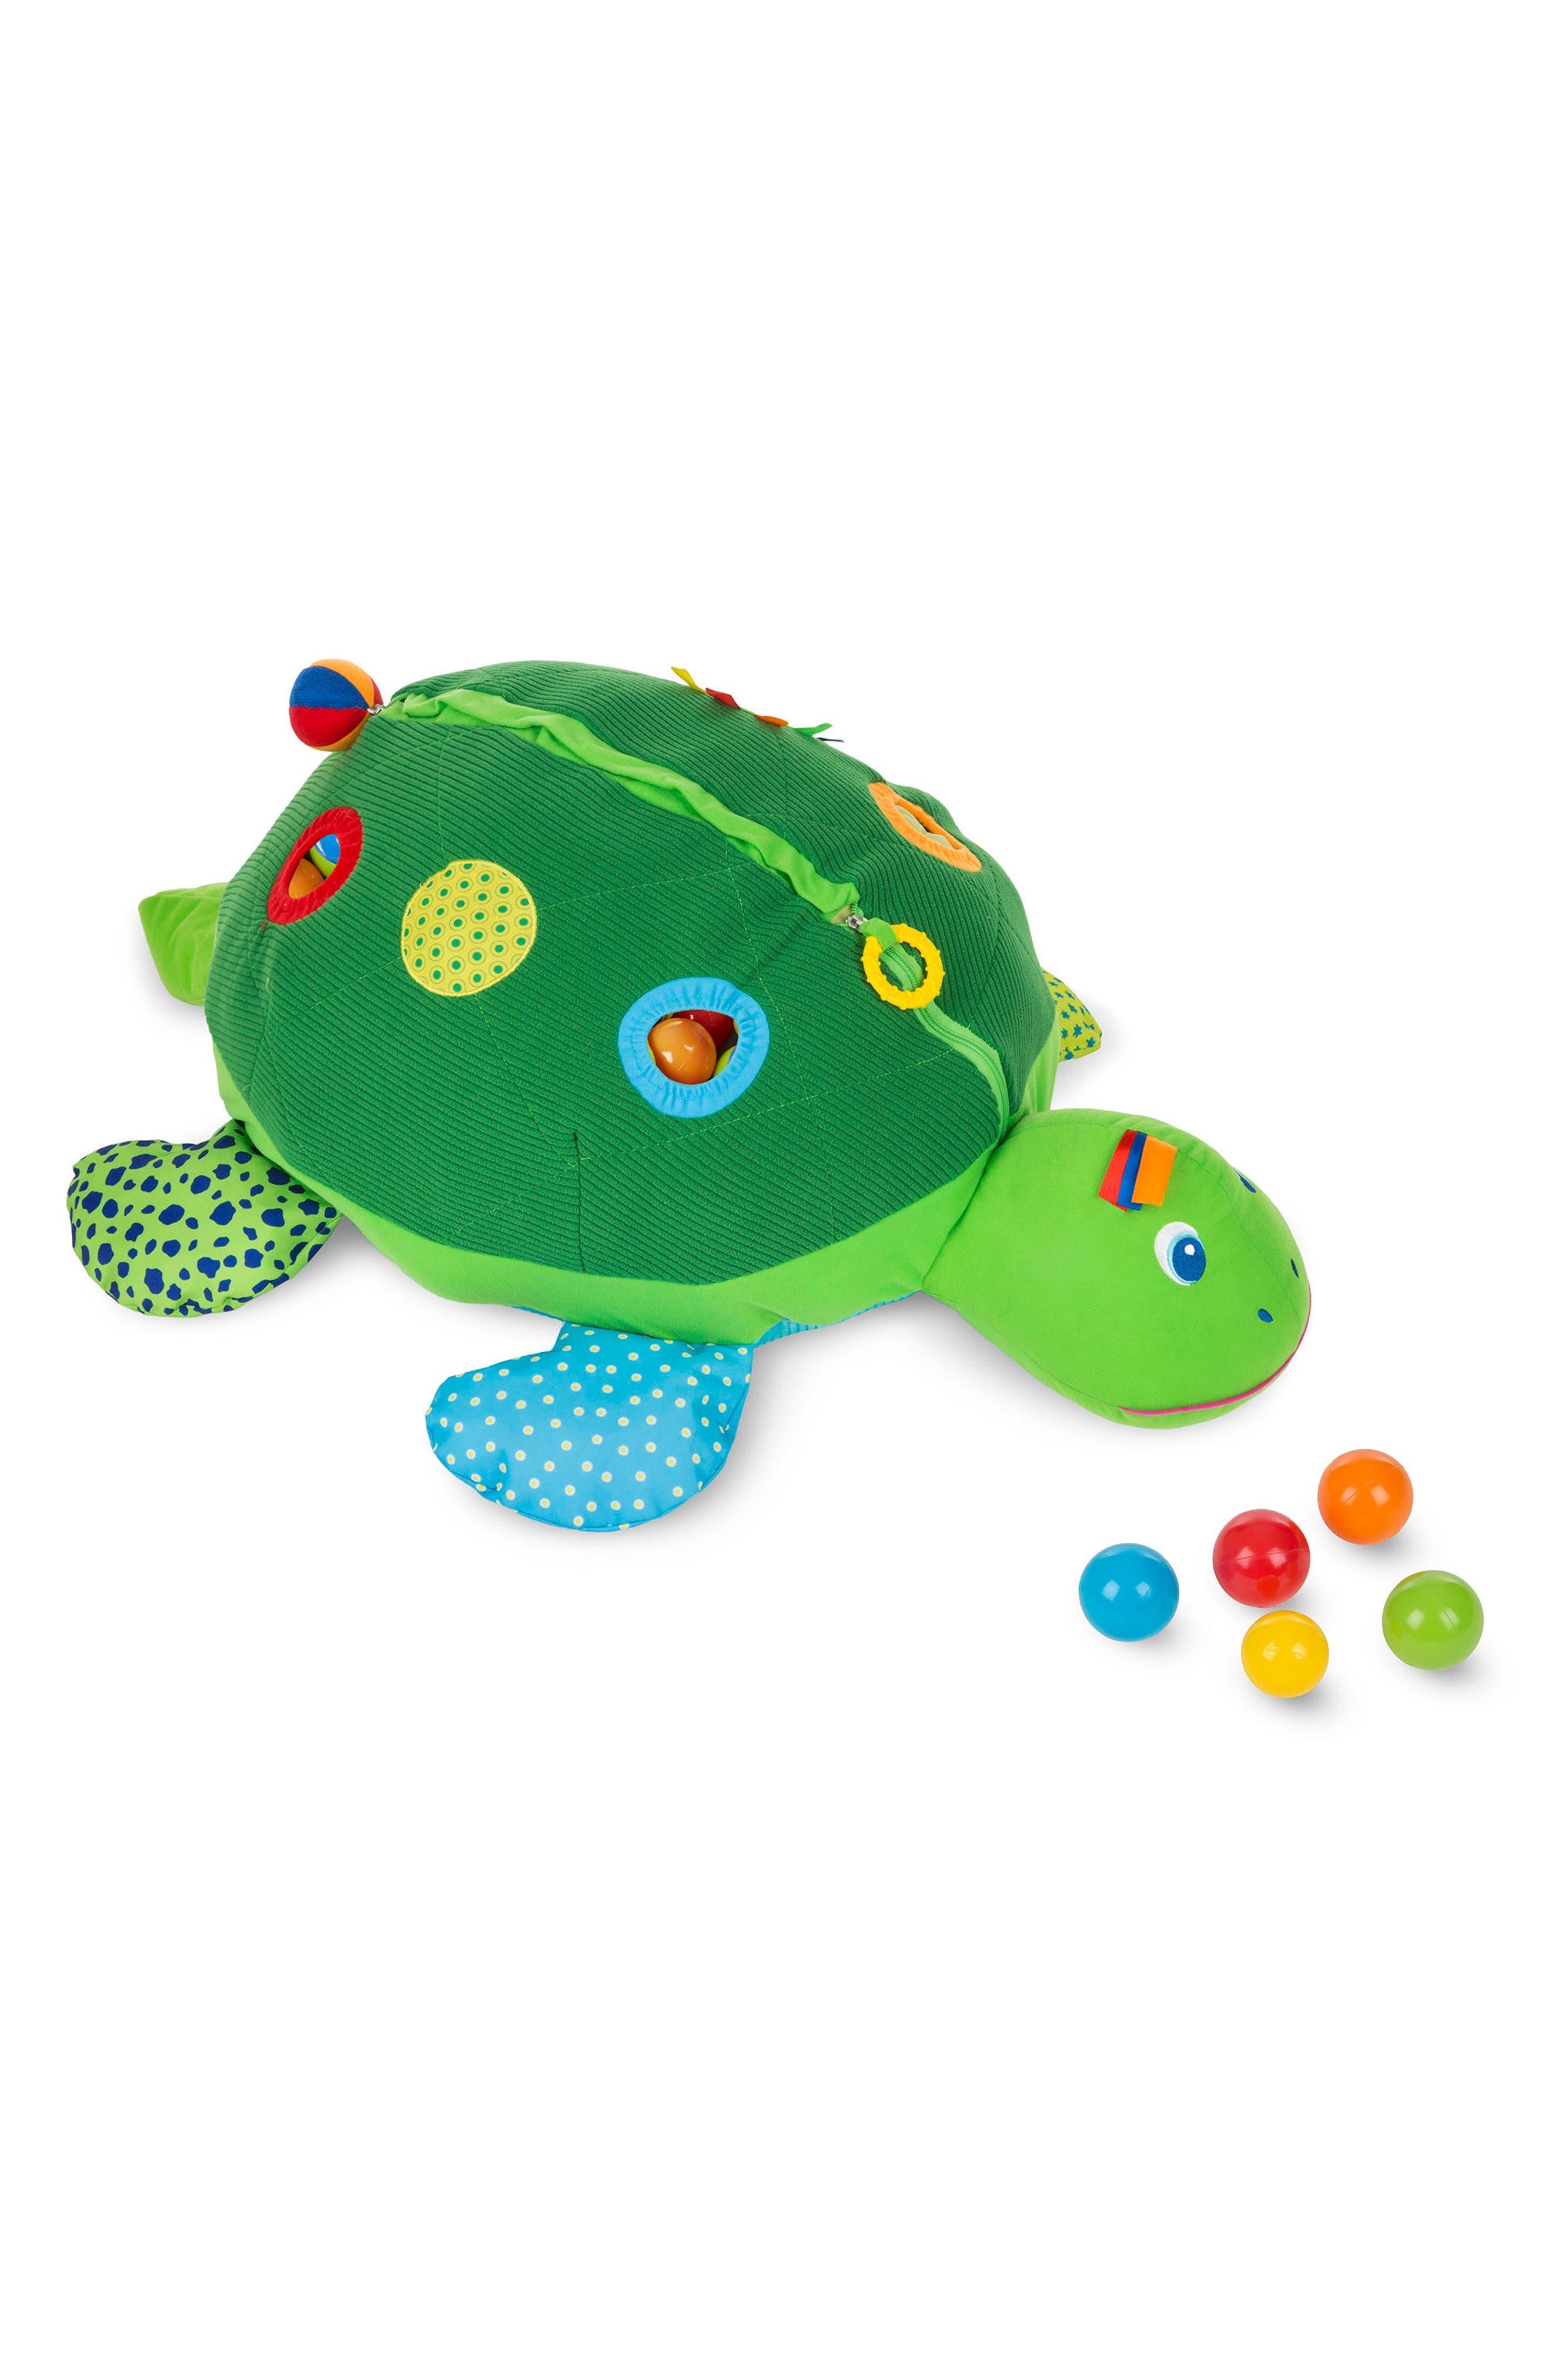 Alternate Image 1 Selected - Melissa & Doug Turtle Ball Pit